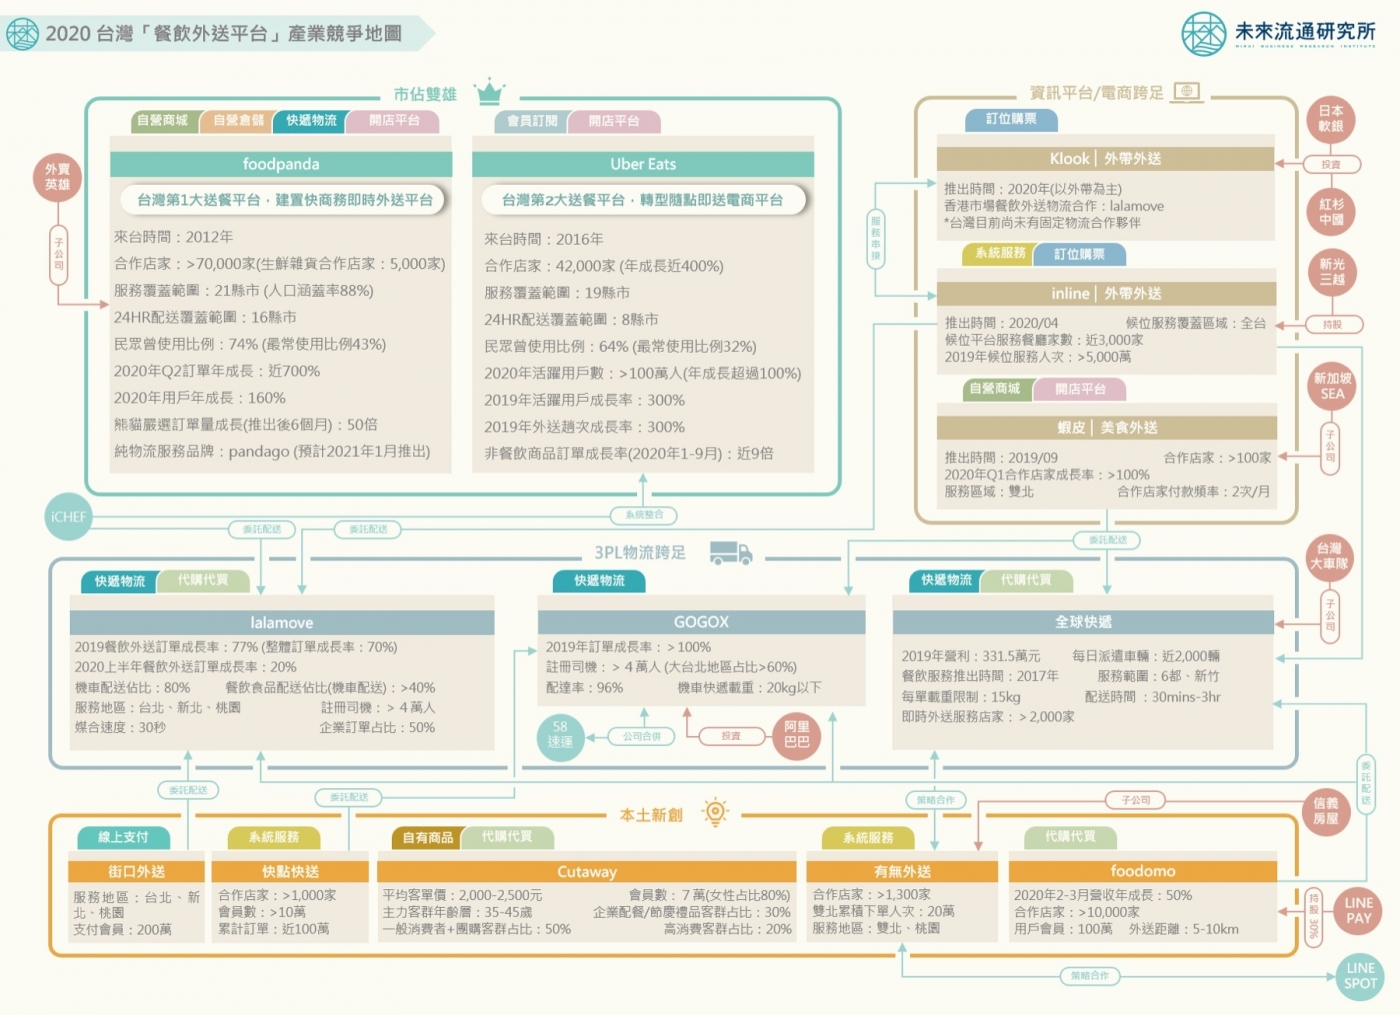 foodpanda、Uber Eats在窮忙?台灣餐飲外送白熱化,4大關鍵情報看懂產業版圖